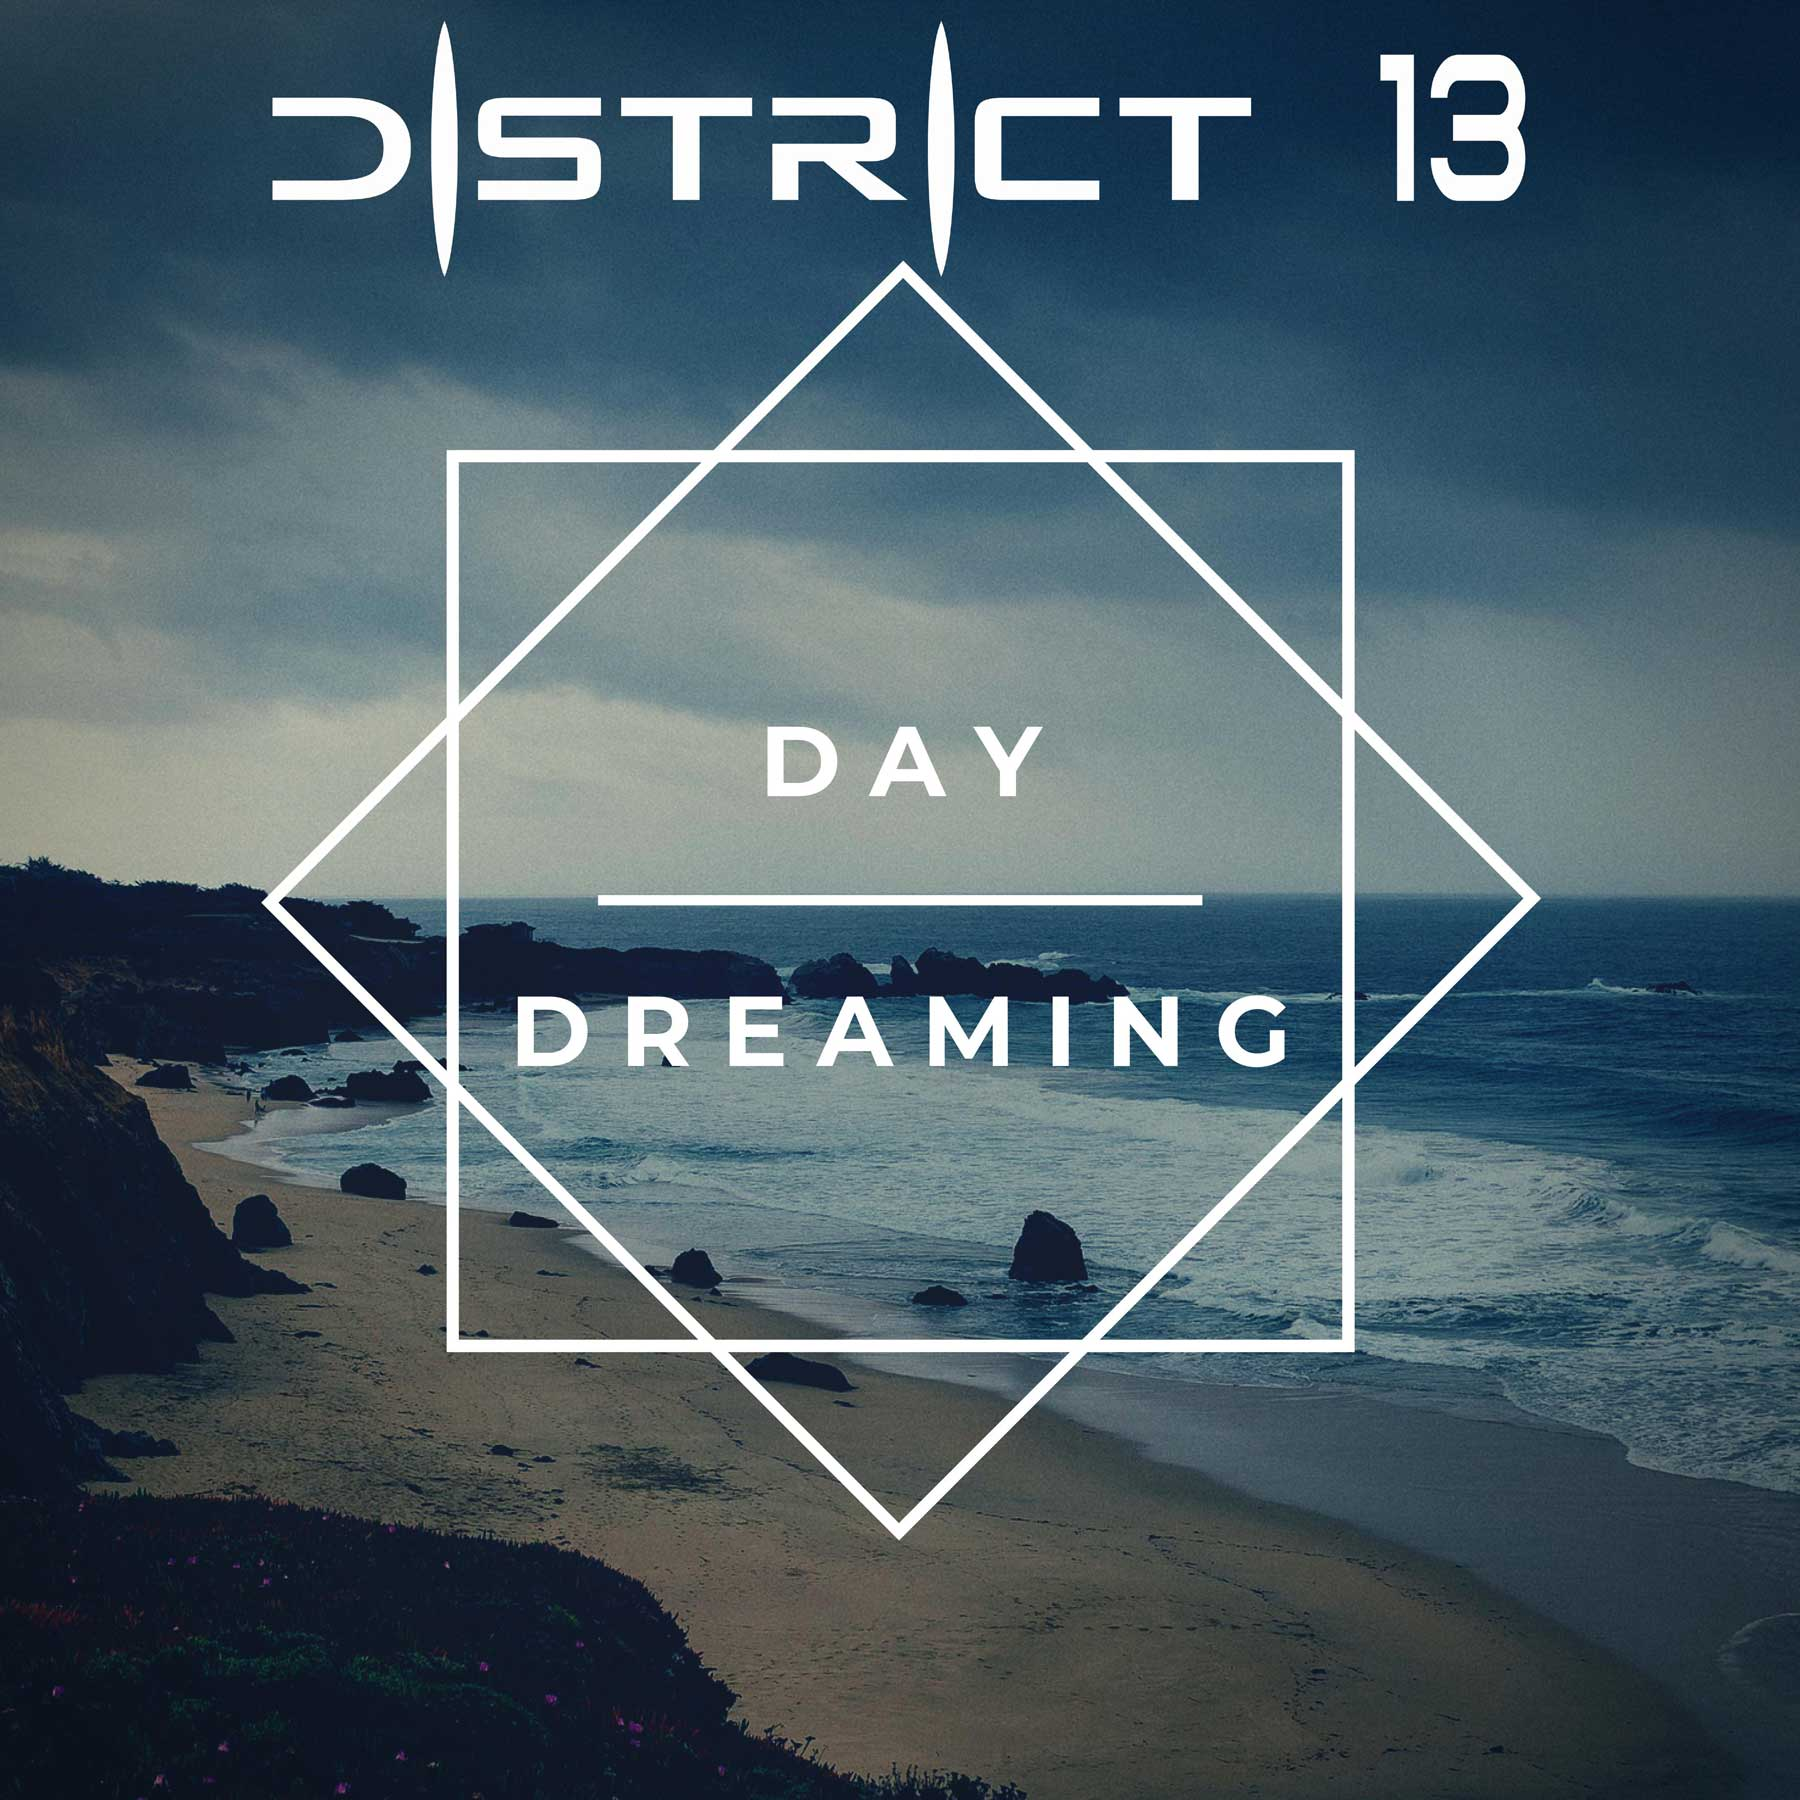 District 13 - Day dreaming - District 13 - Day dreaming